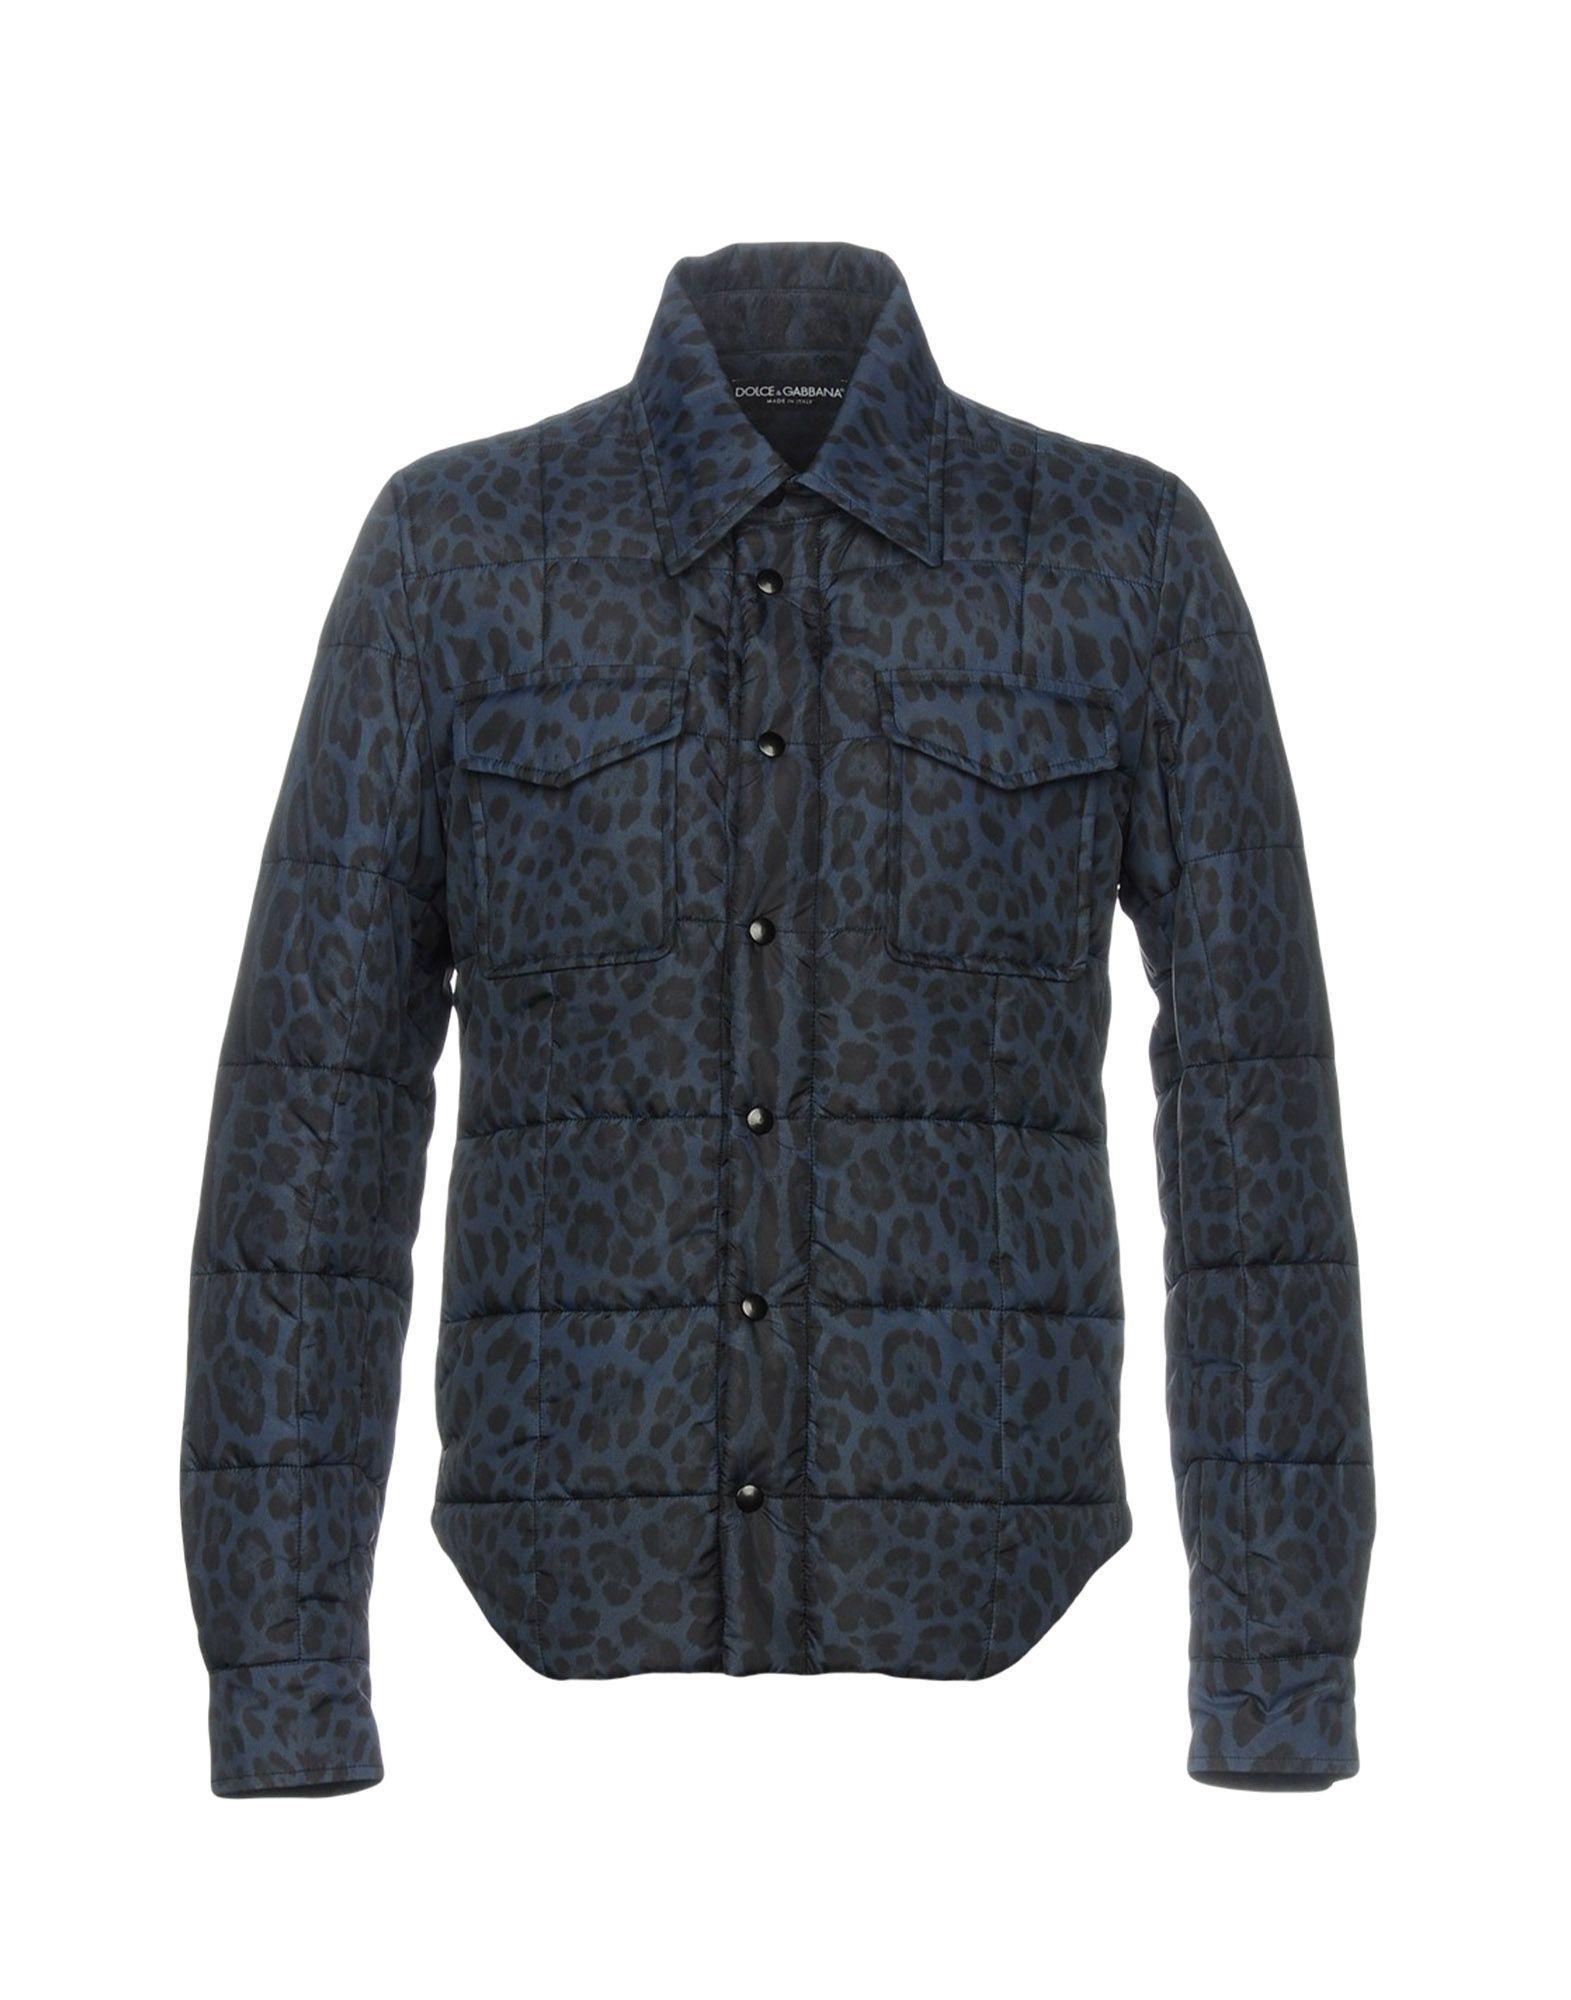 Dolce & Gabbana Synthetic Down Jackets In Dark Blue